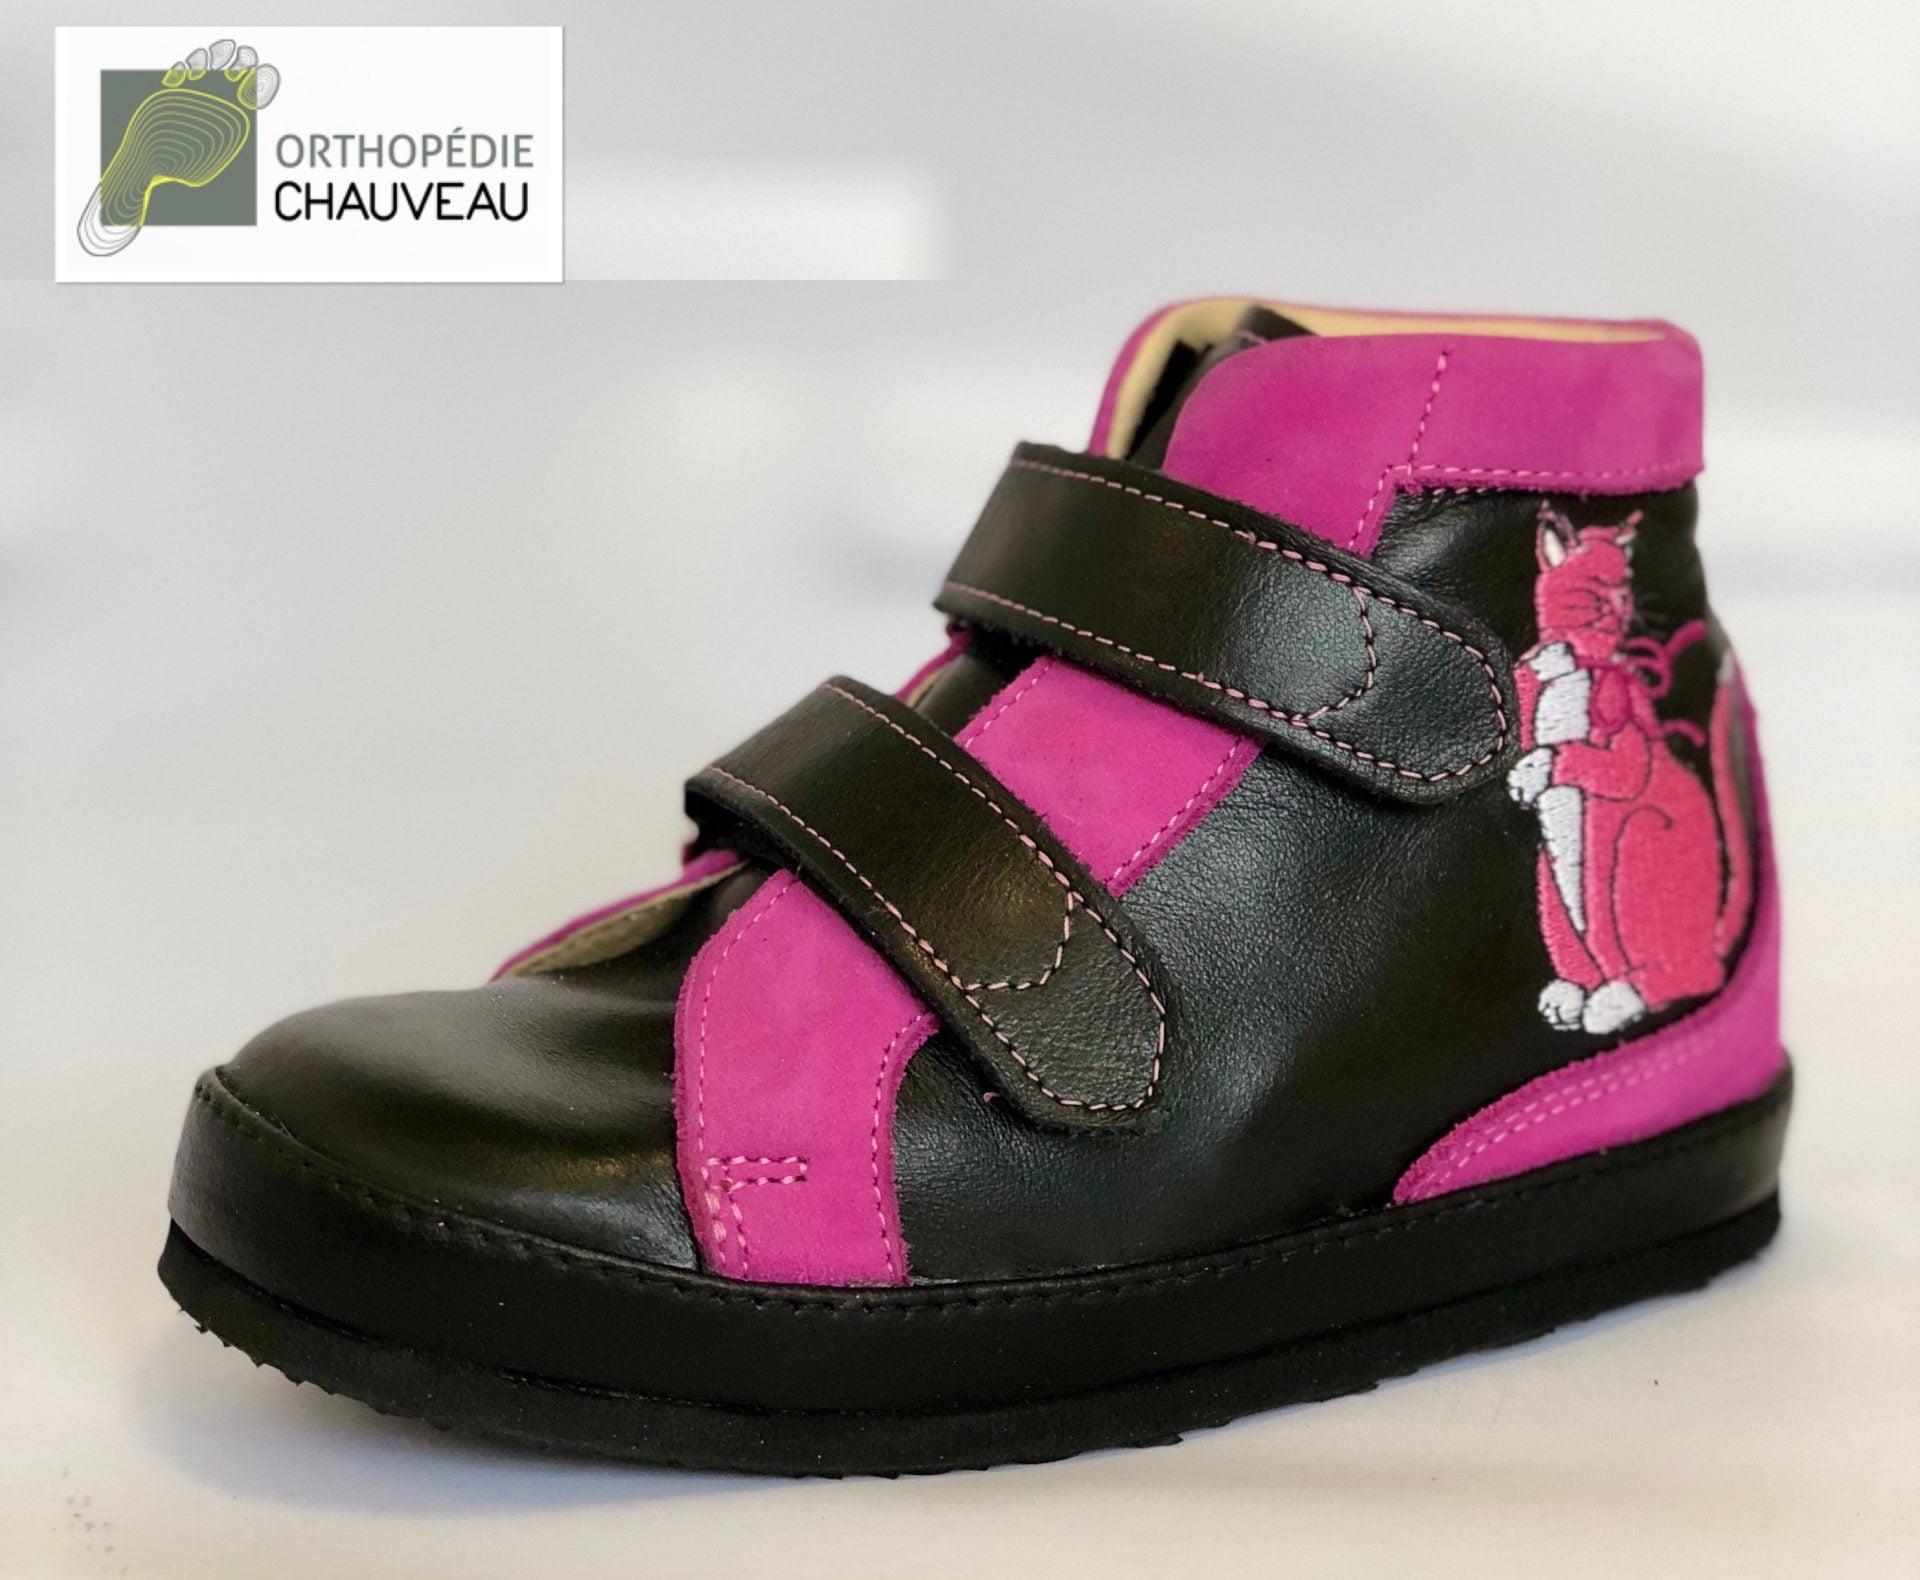 chaussures orthopediques Rennes st malo enfant